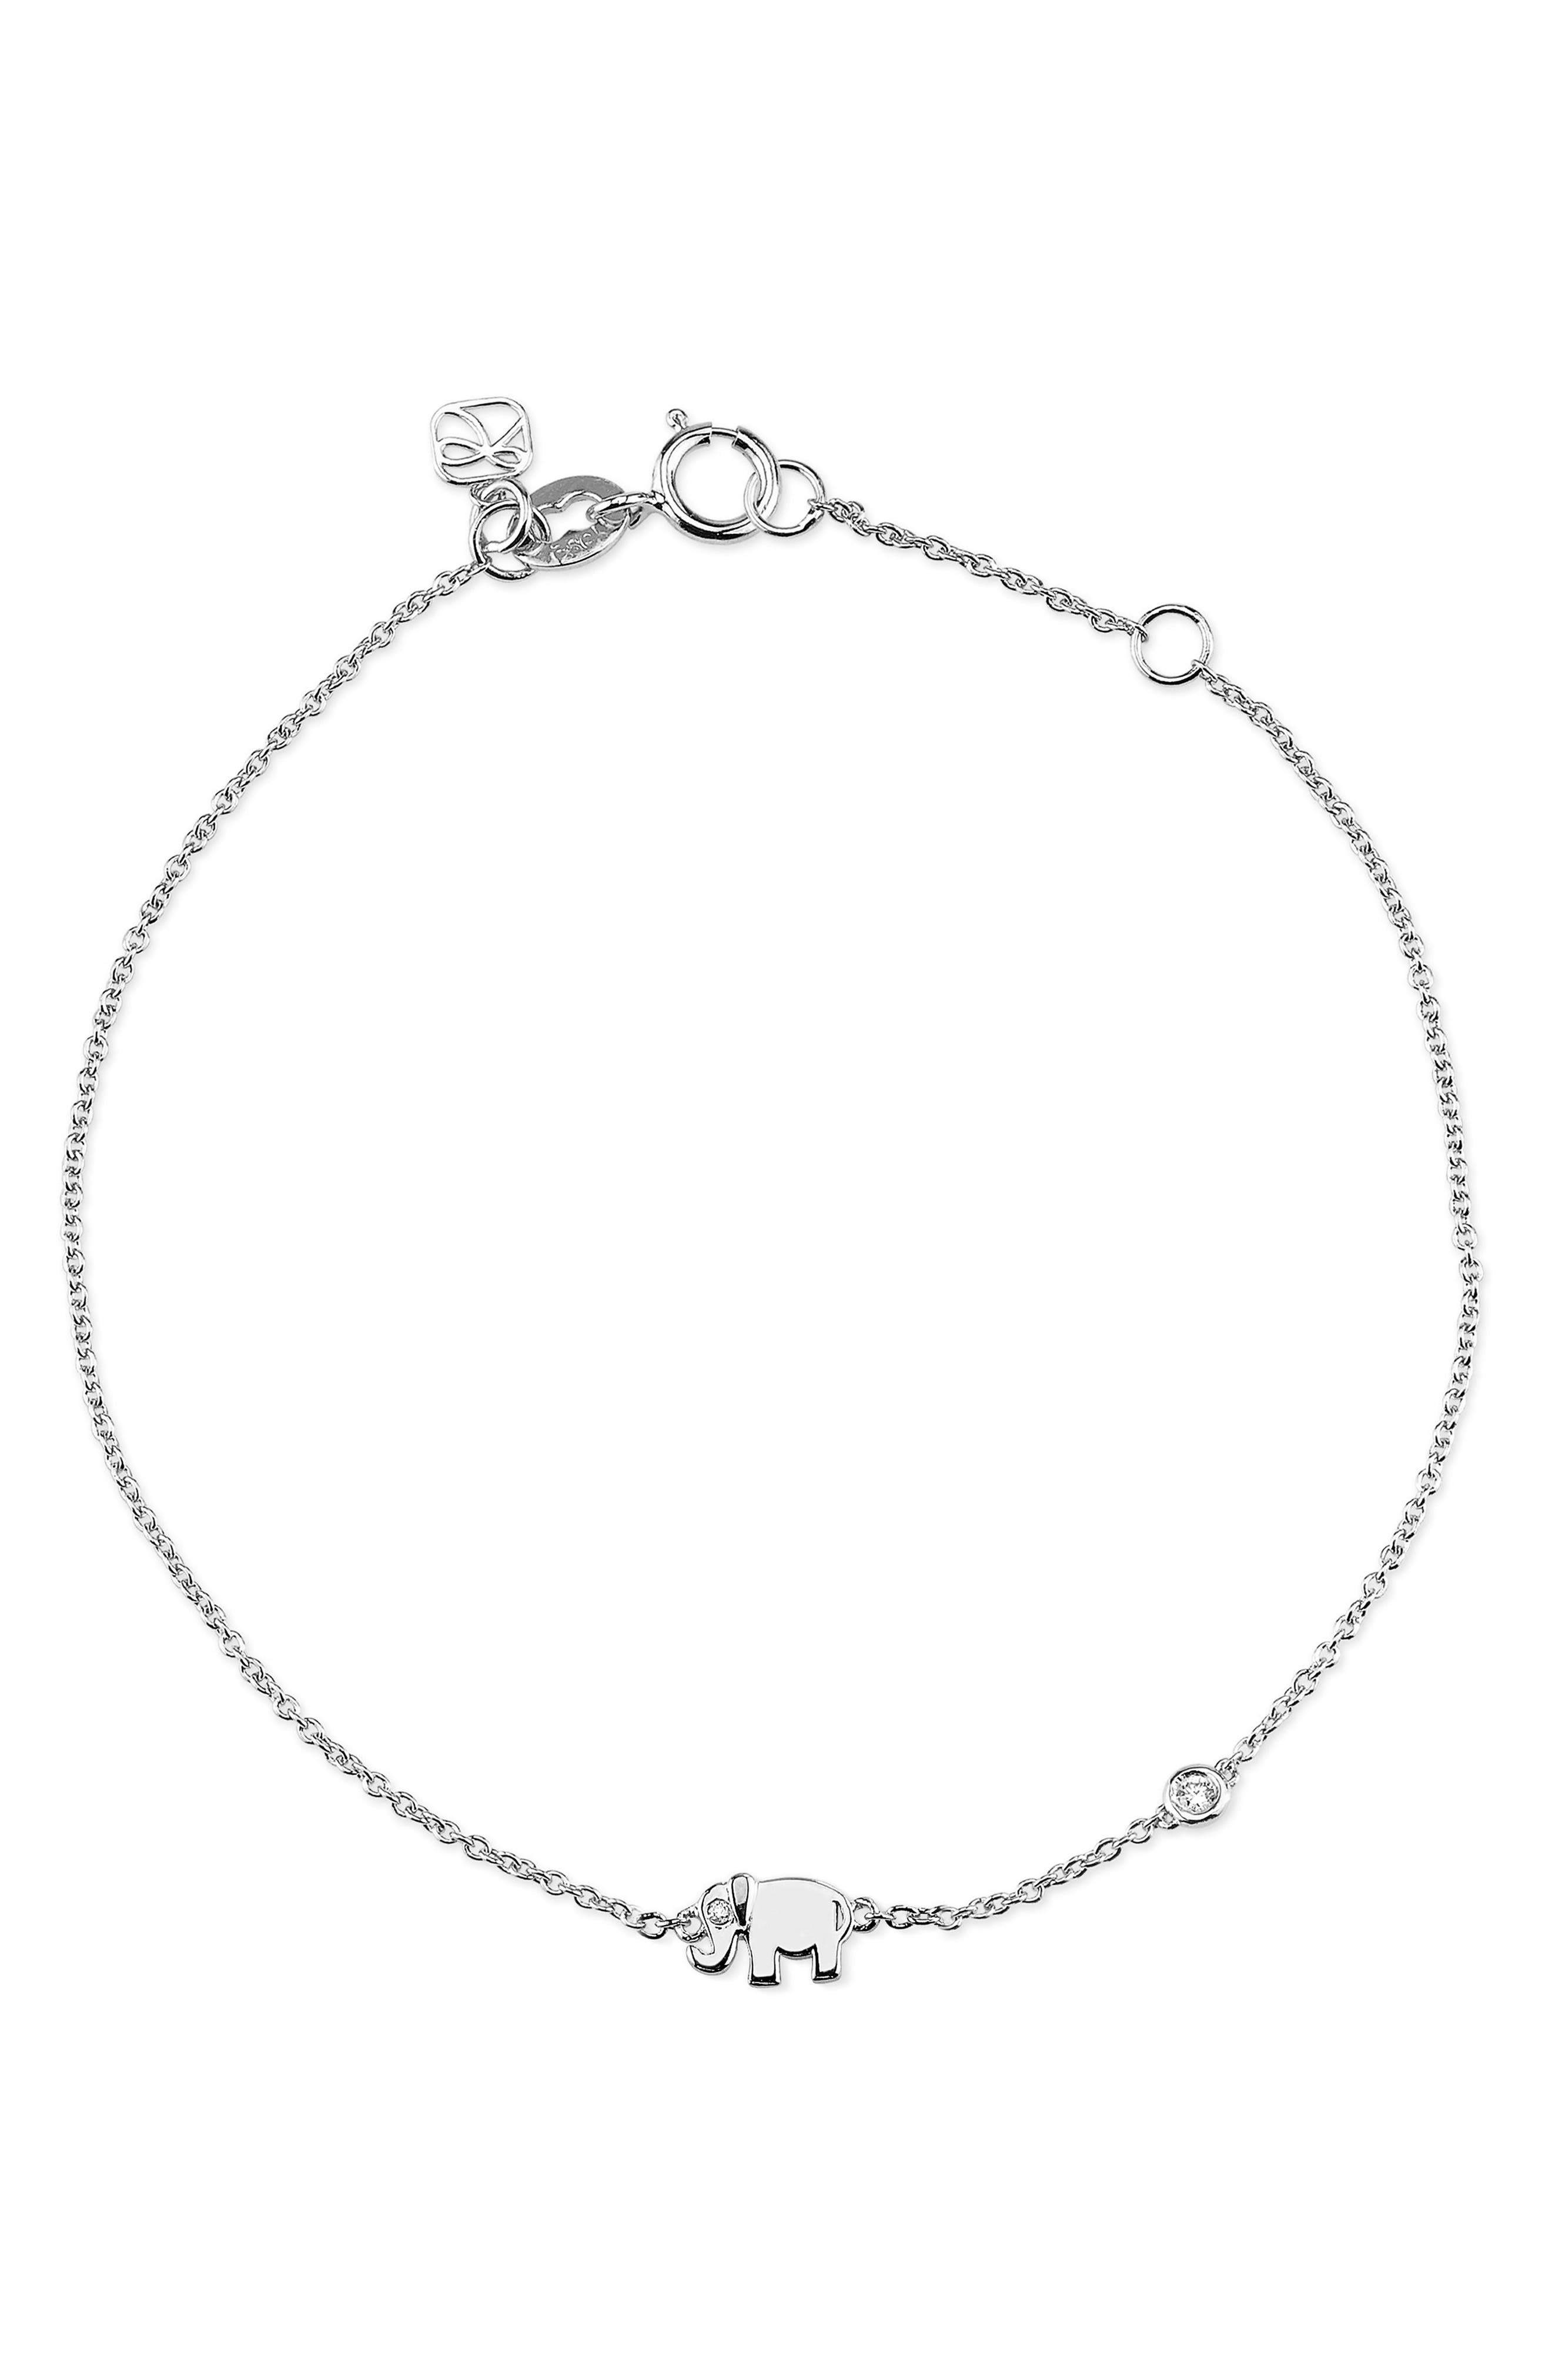 Infinity Chain Bracelet,                             Main thumbnail 1, color,                             SILVER